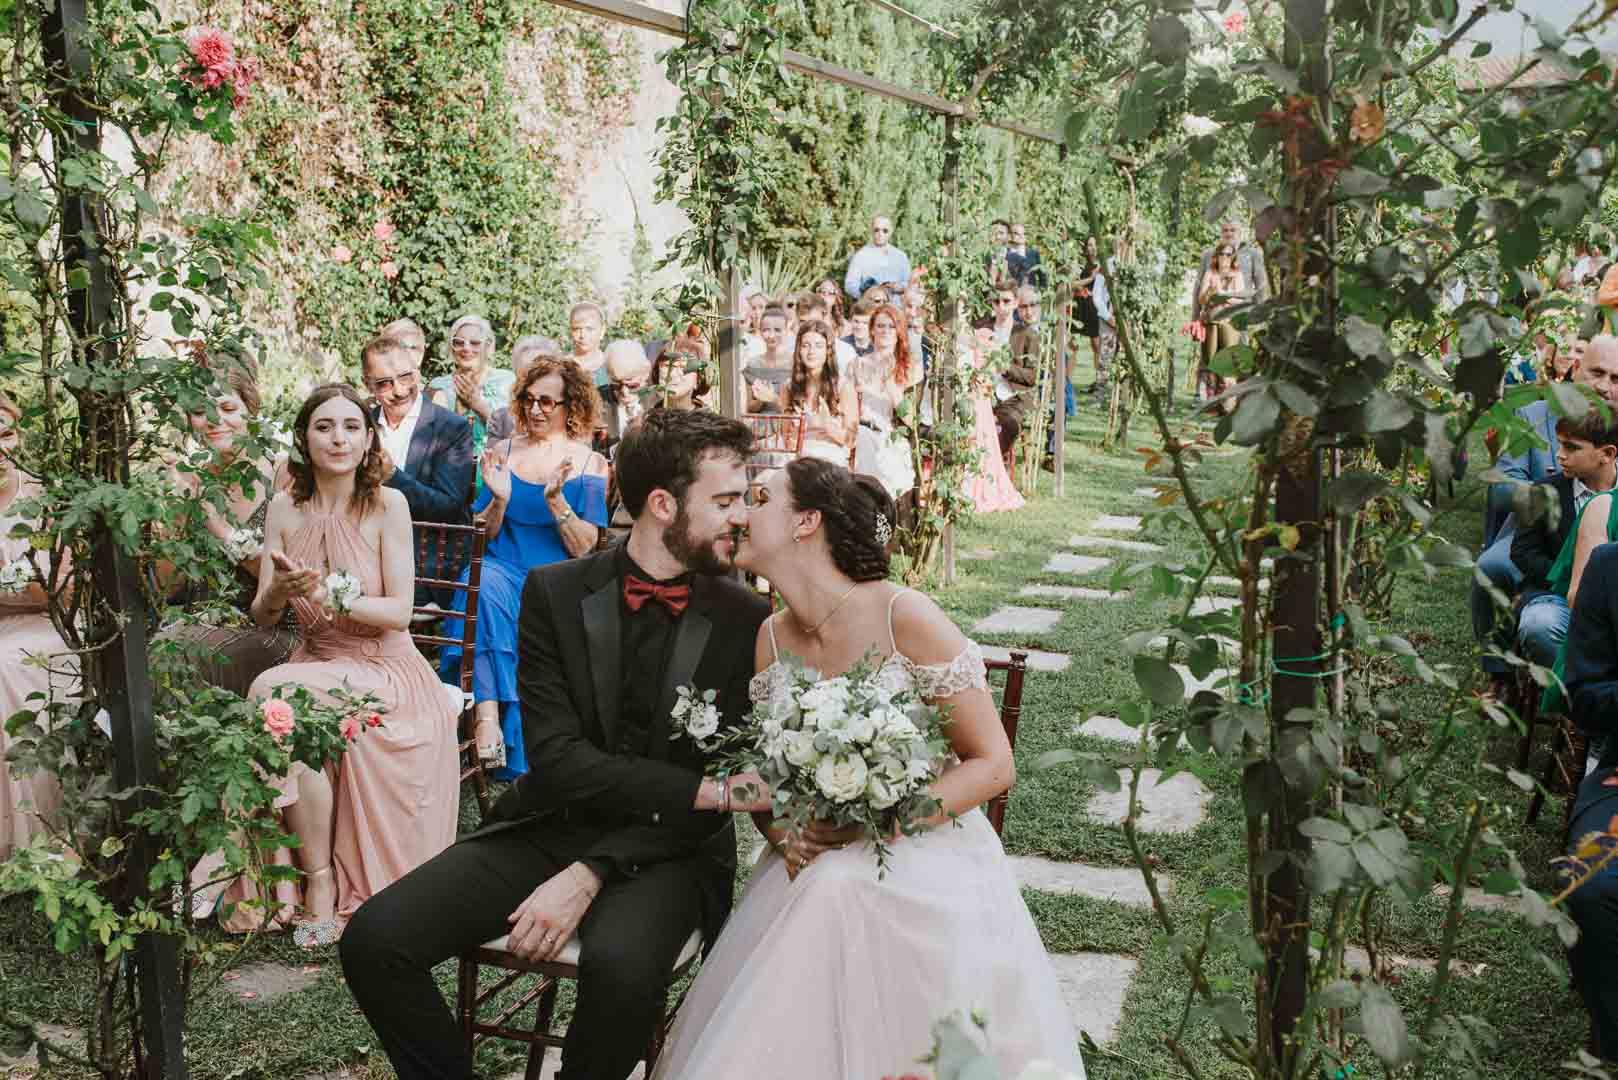 wedding-photographer-destination-fineart-bespoke-reportage-tuscany-villascorzi-vivianeizzo-spazio46-82